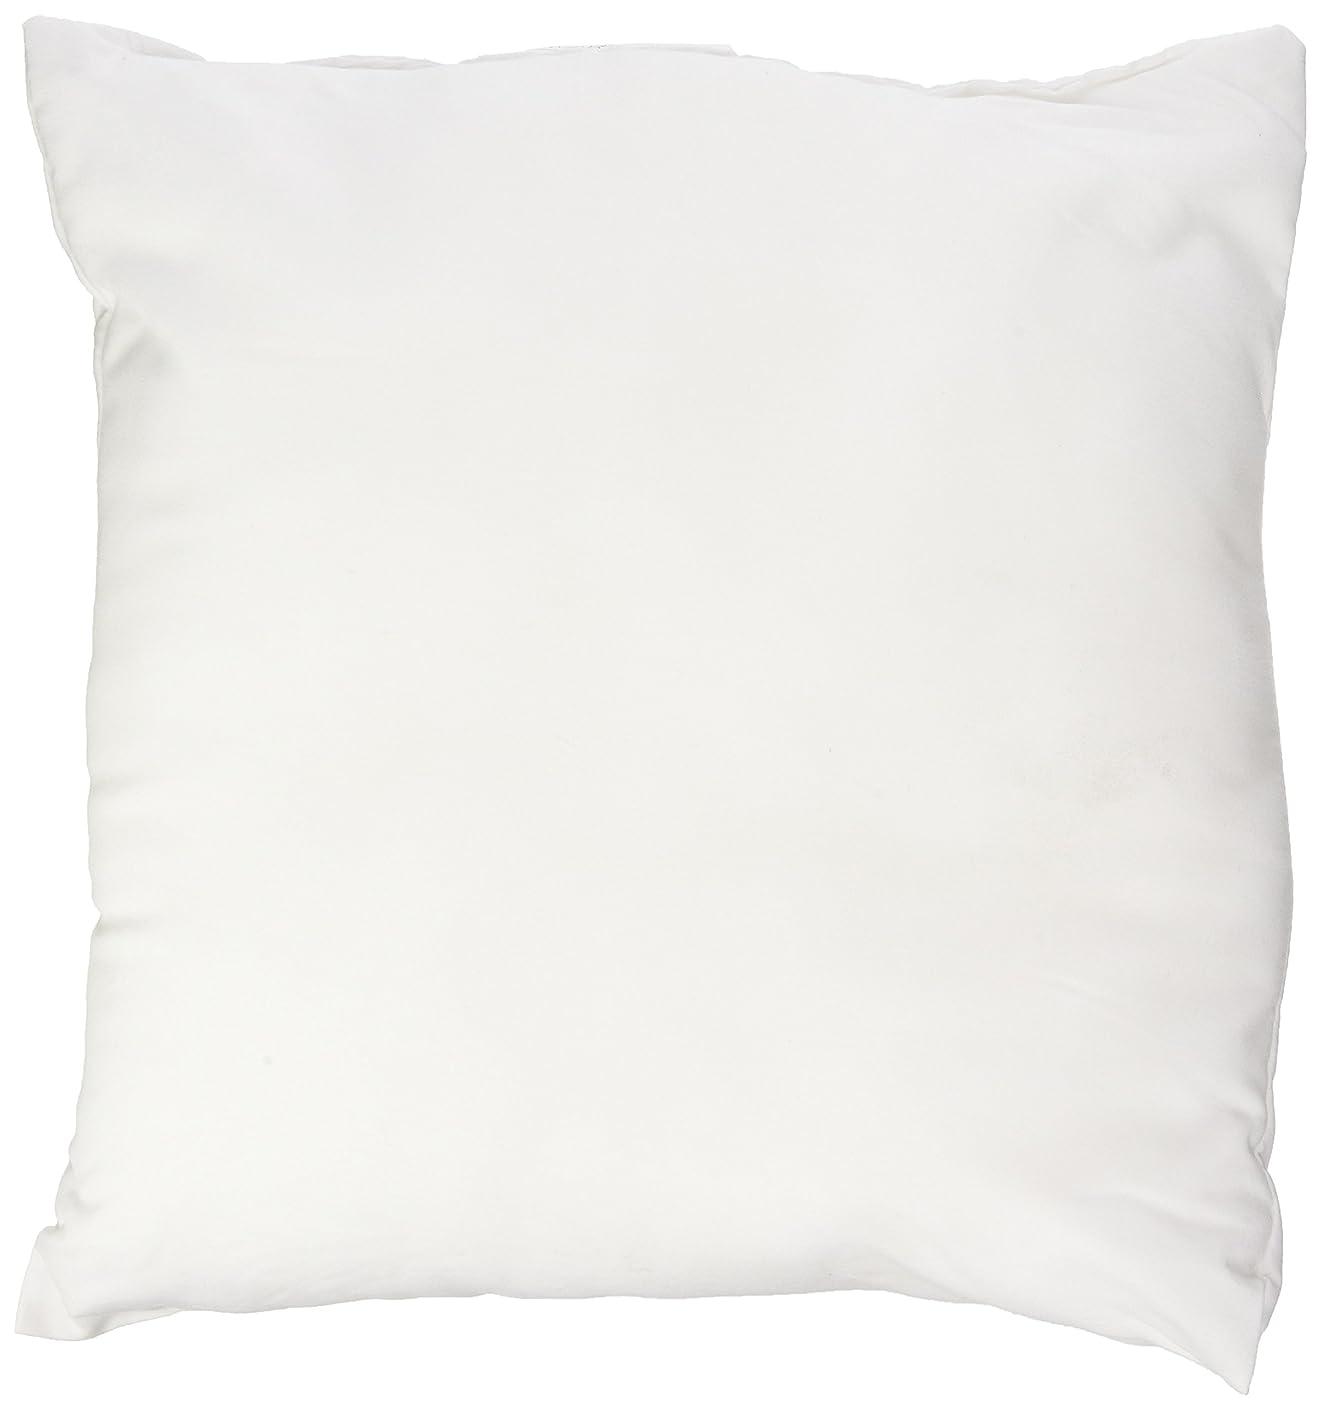 Pellon PPI12x12 Decorative Pillow Form, 12